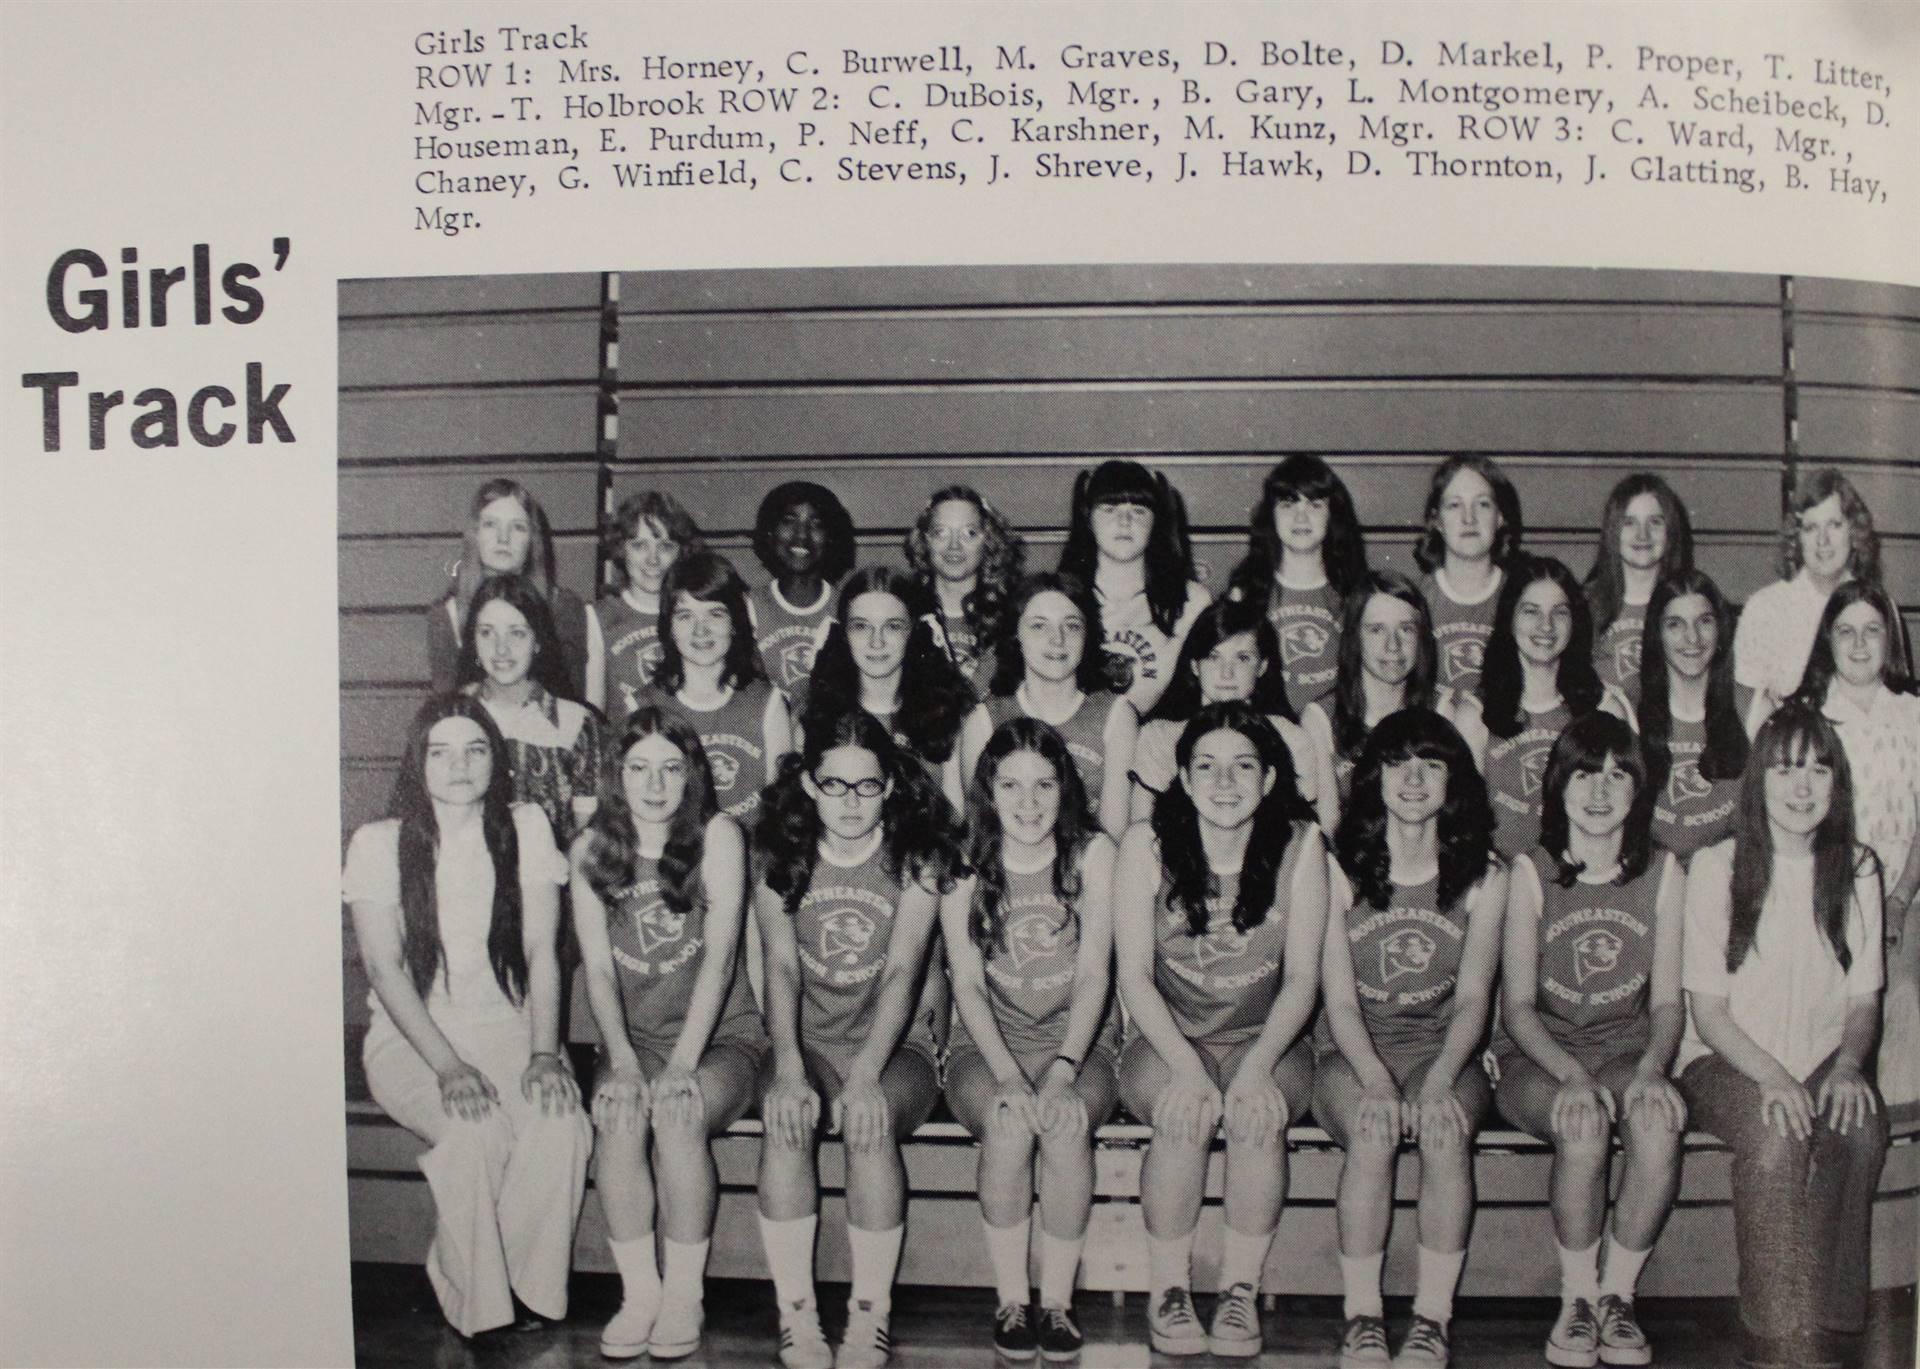 1973 Girls' Track